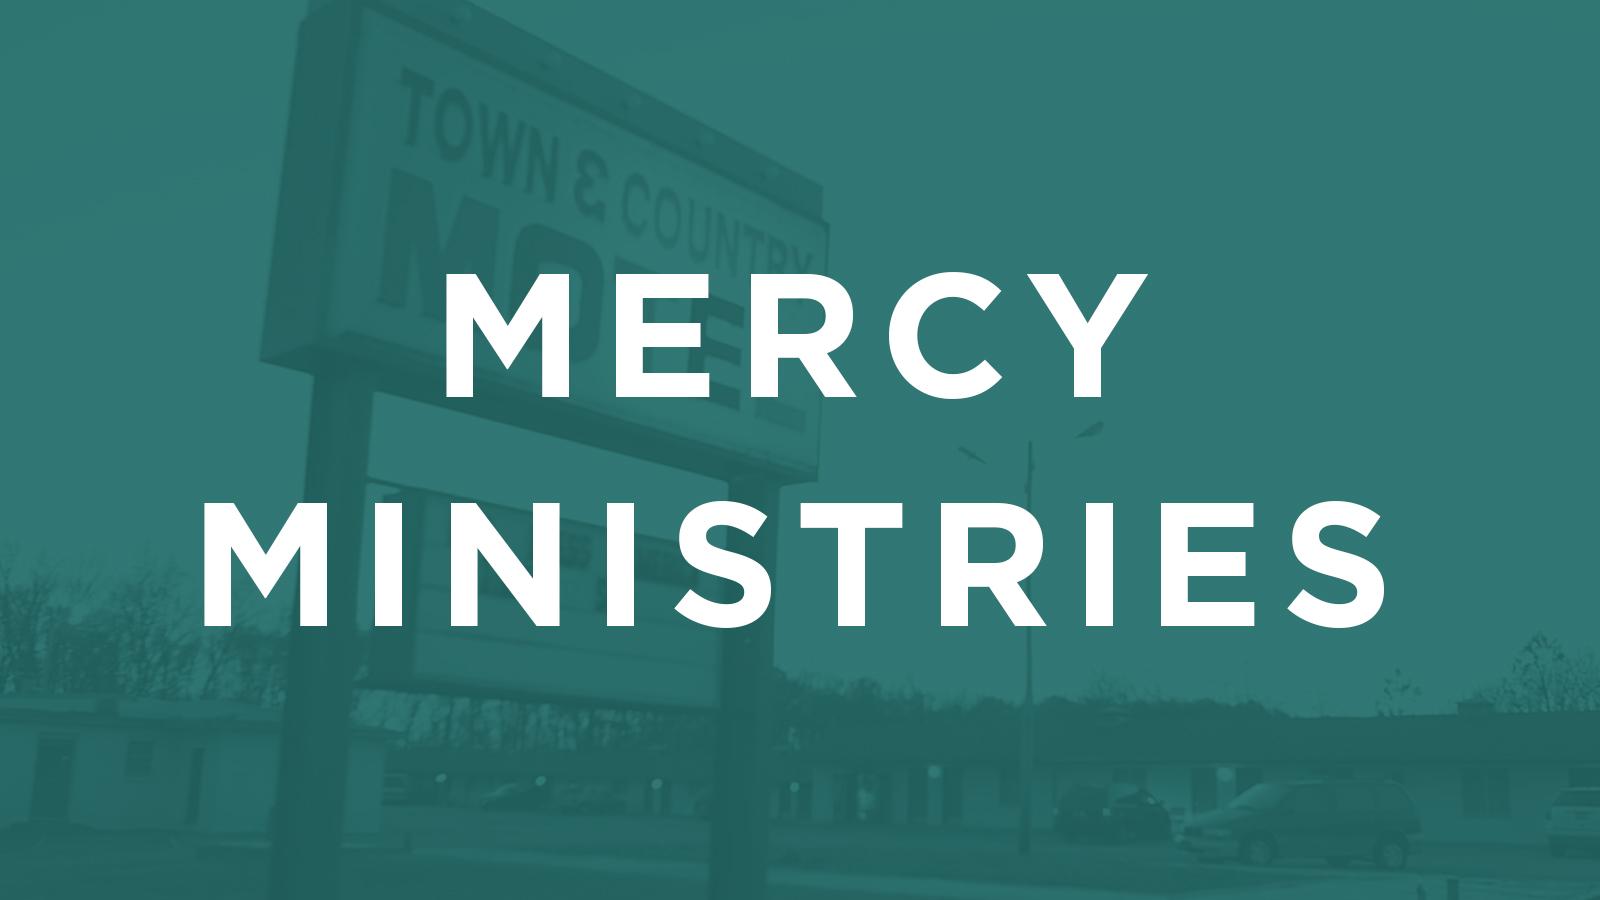 MercyMinistries.jpg